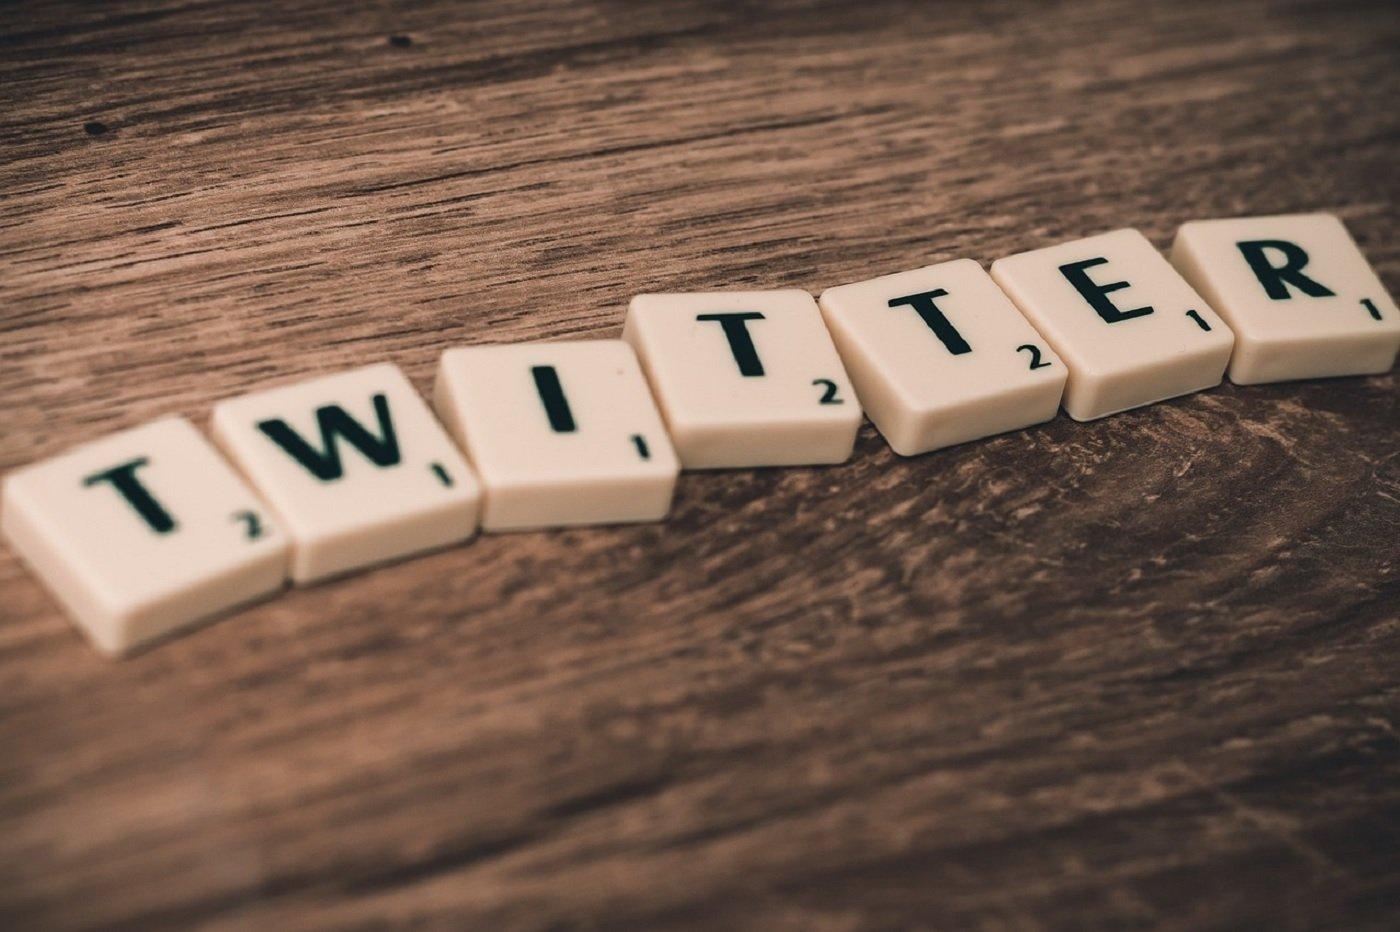 Twitter et scrabble